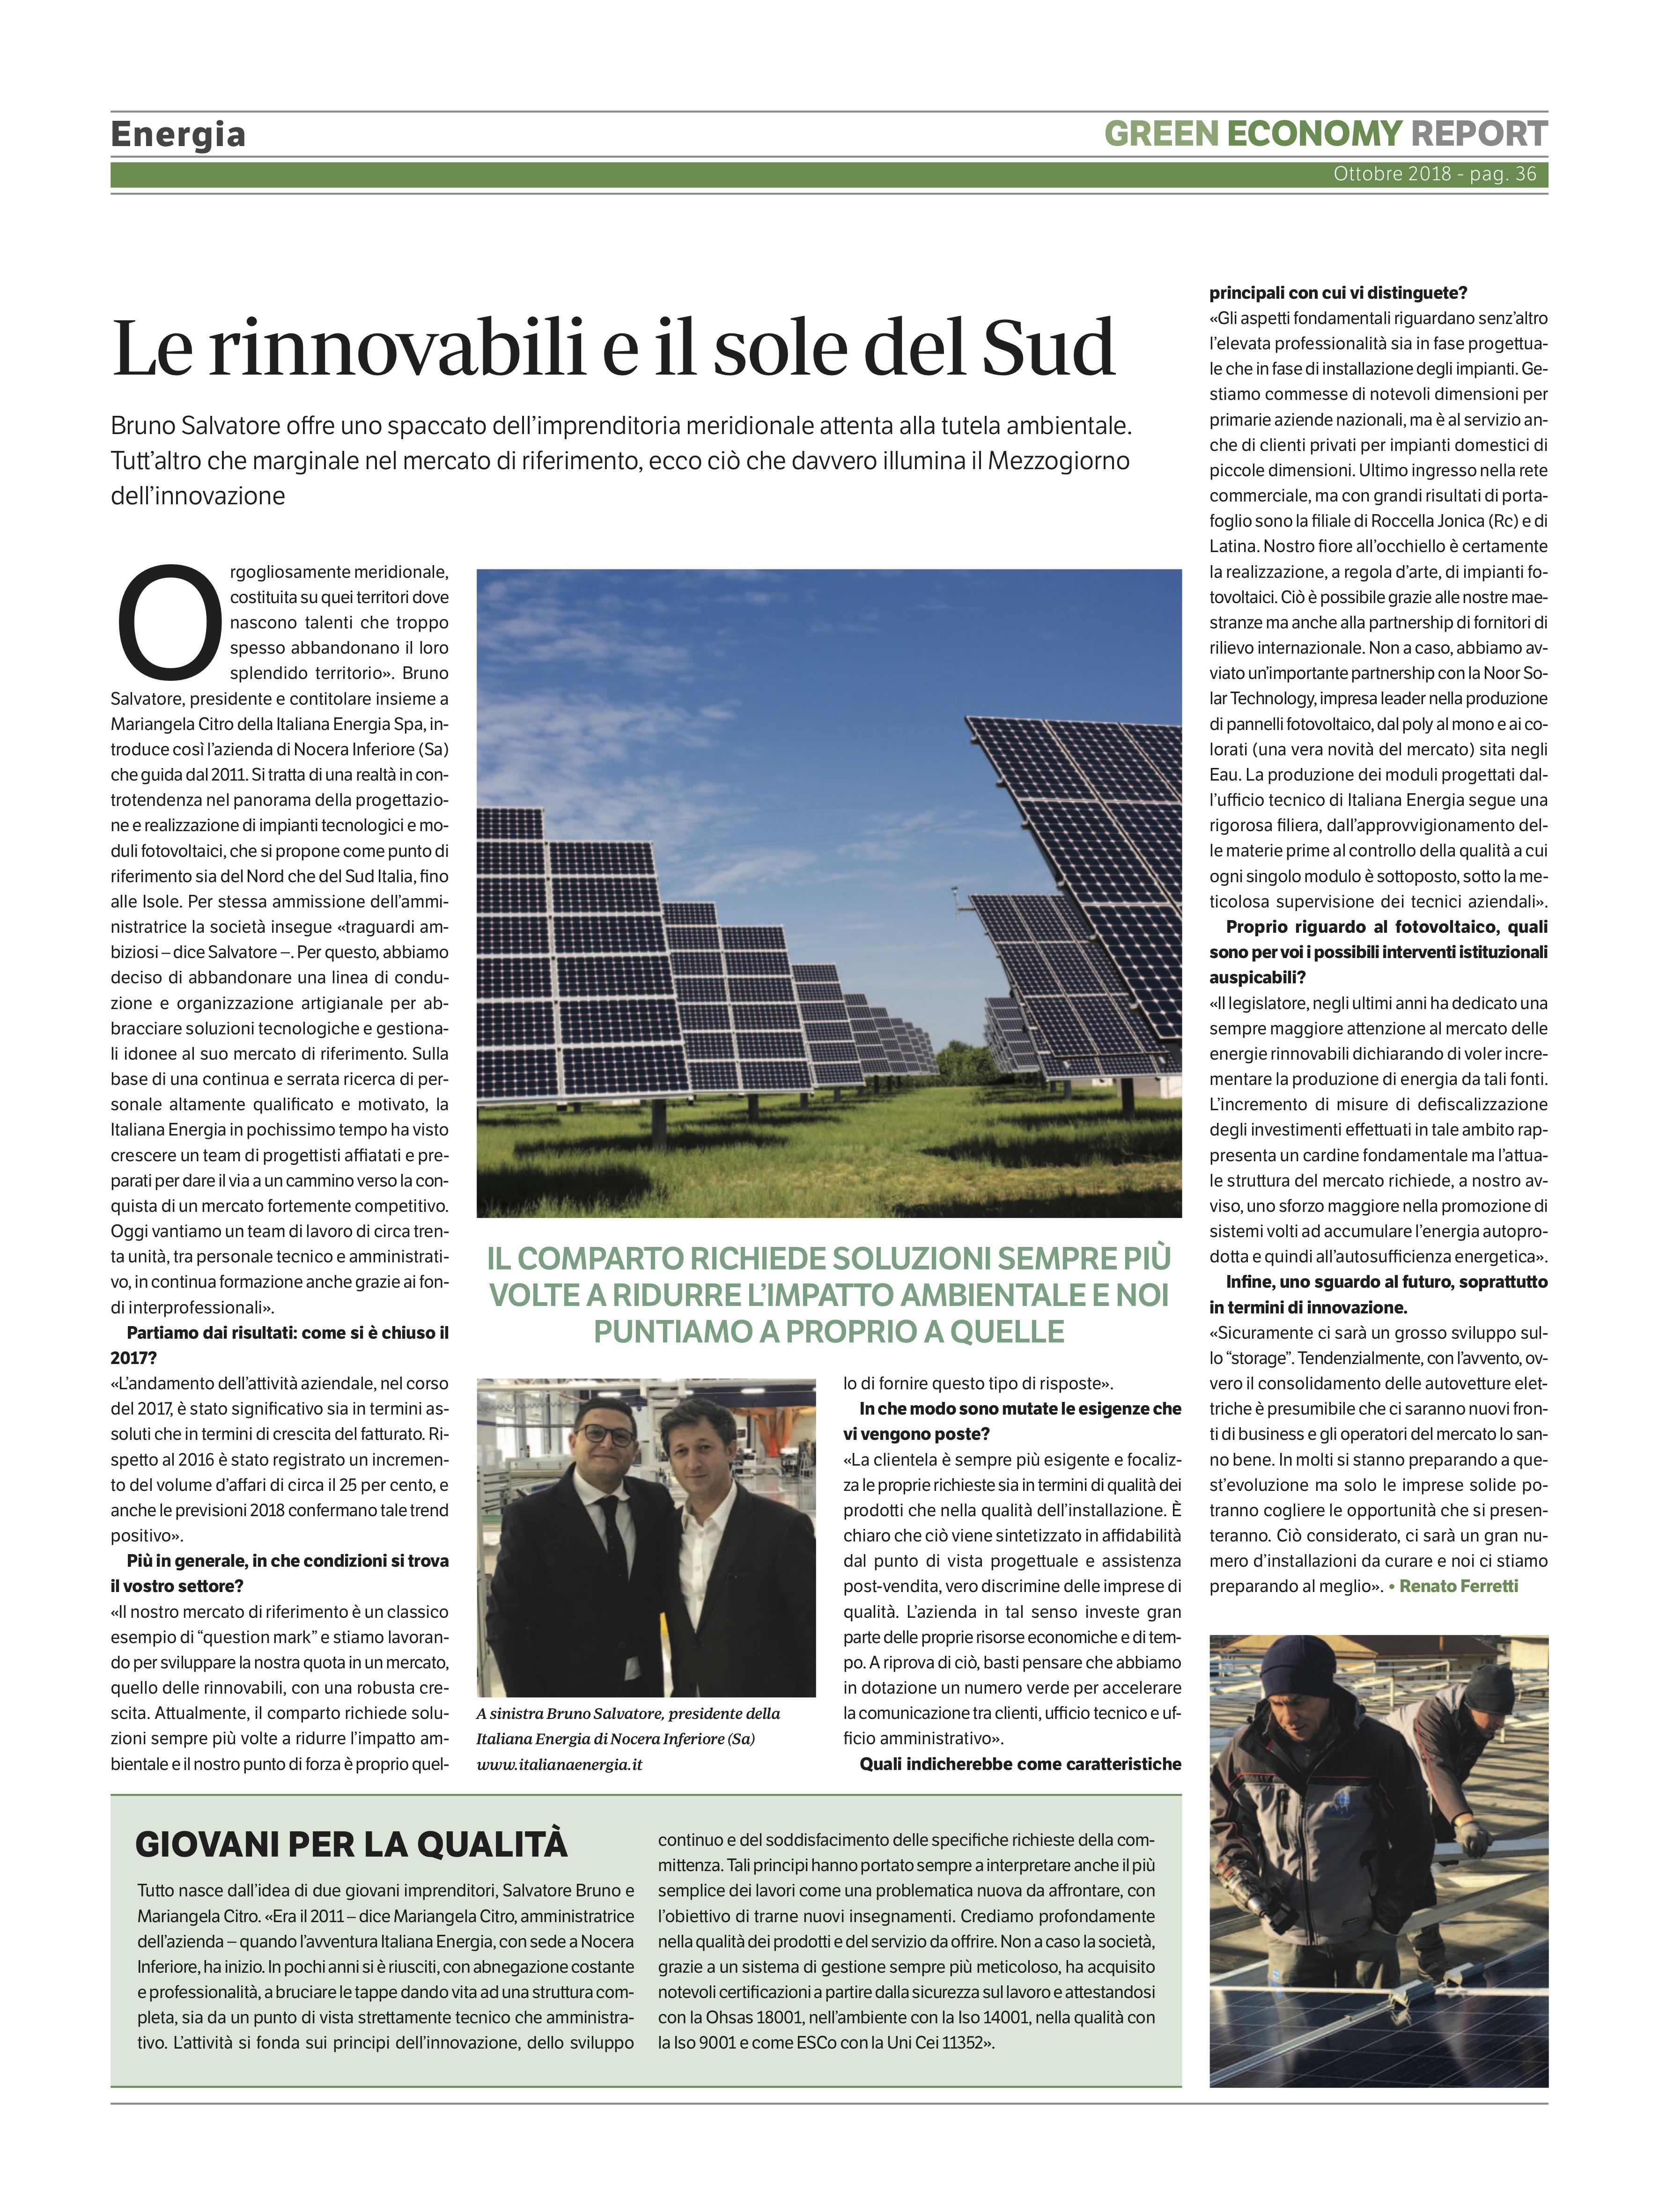 Green Economy-Italiana Energia-pag36